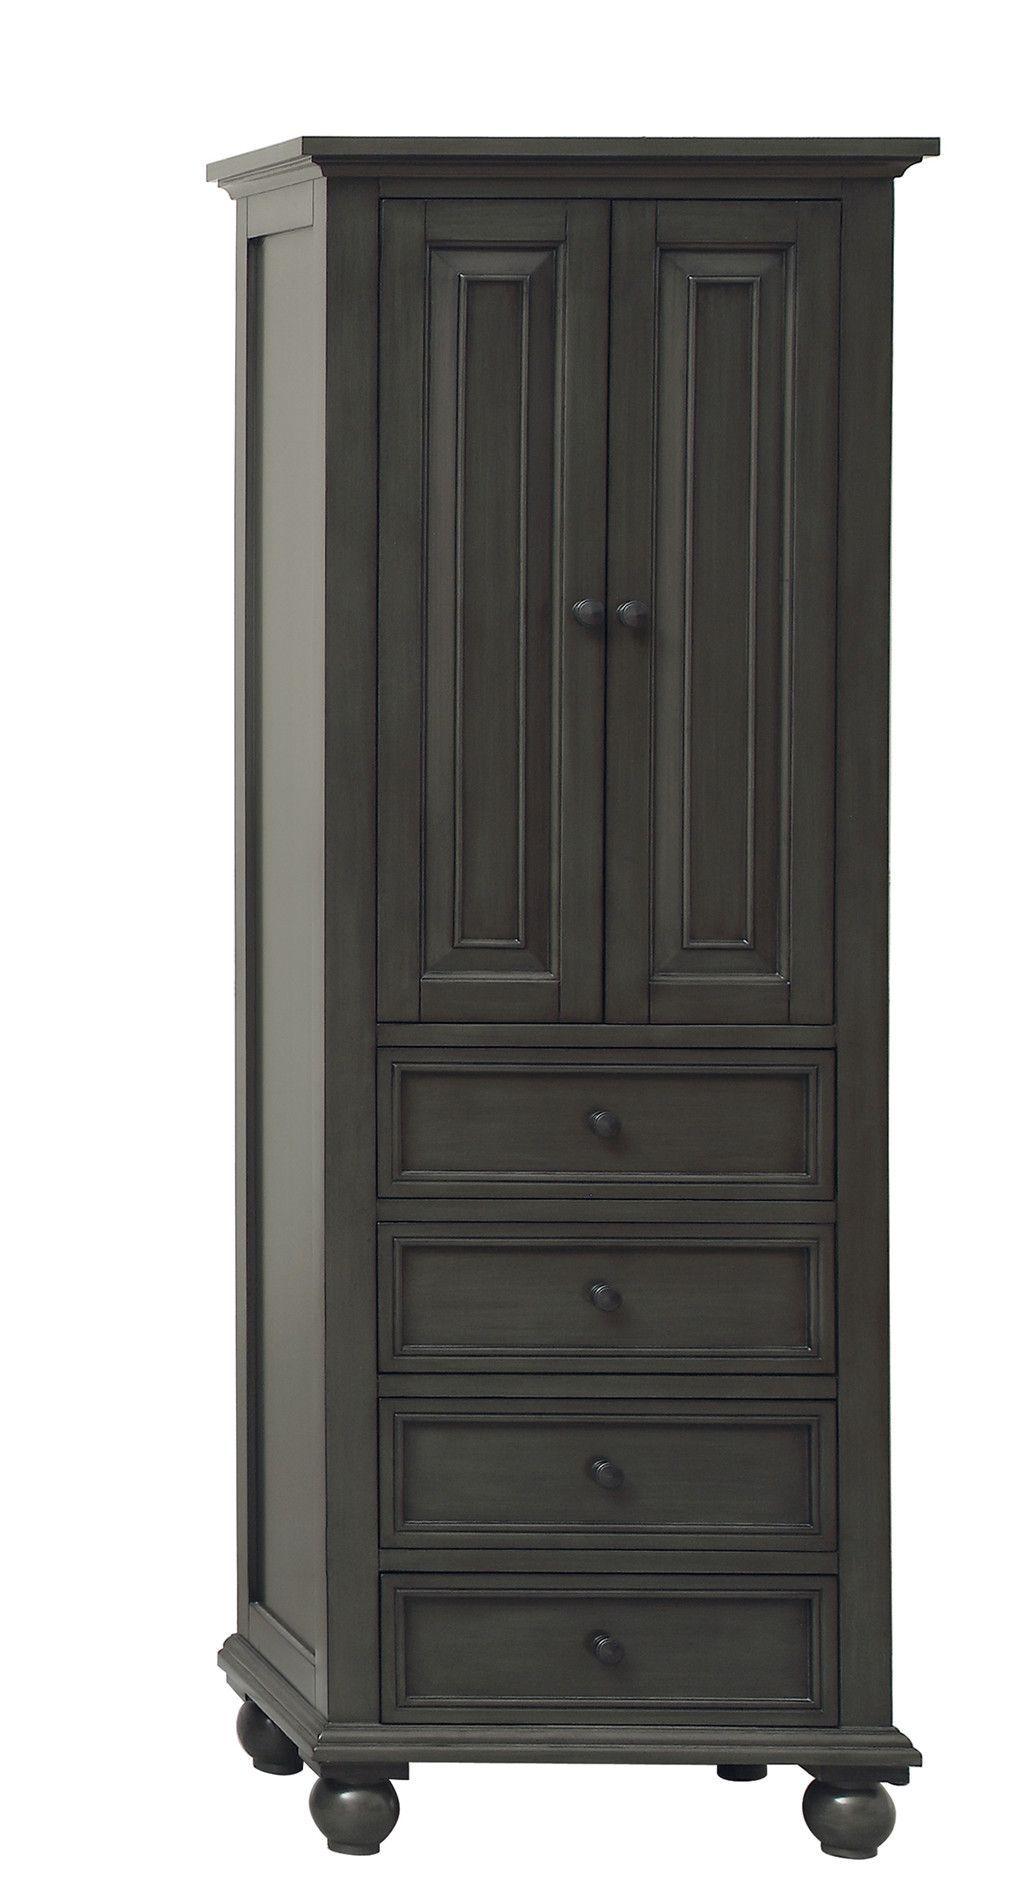 Thompson 24 X 68 Freestanding Bathroom Linen Tower Cabinet